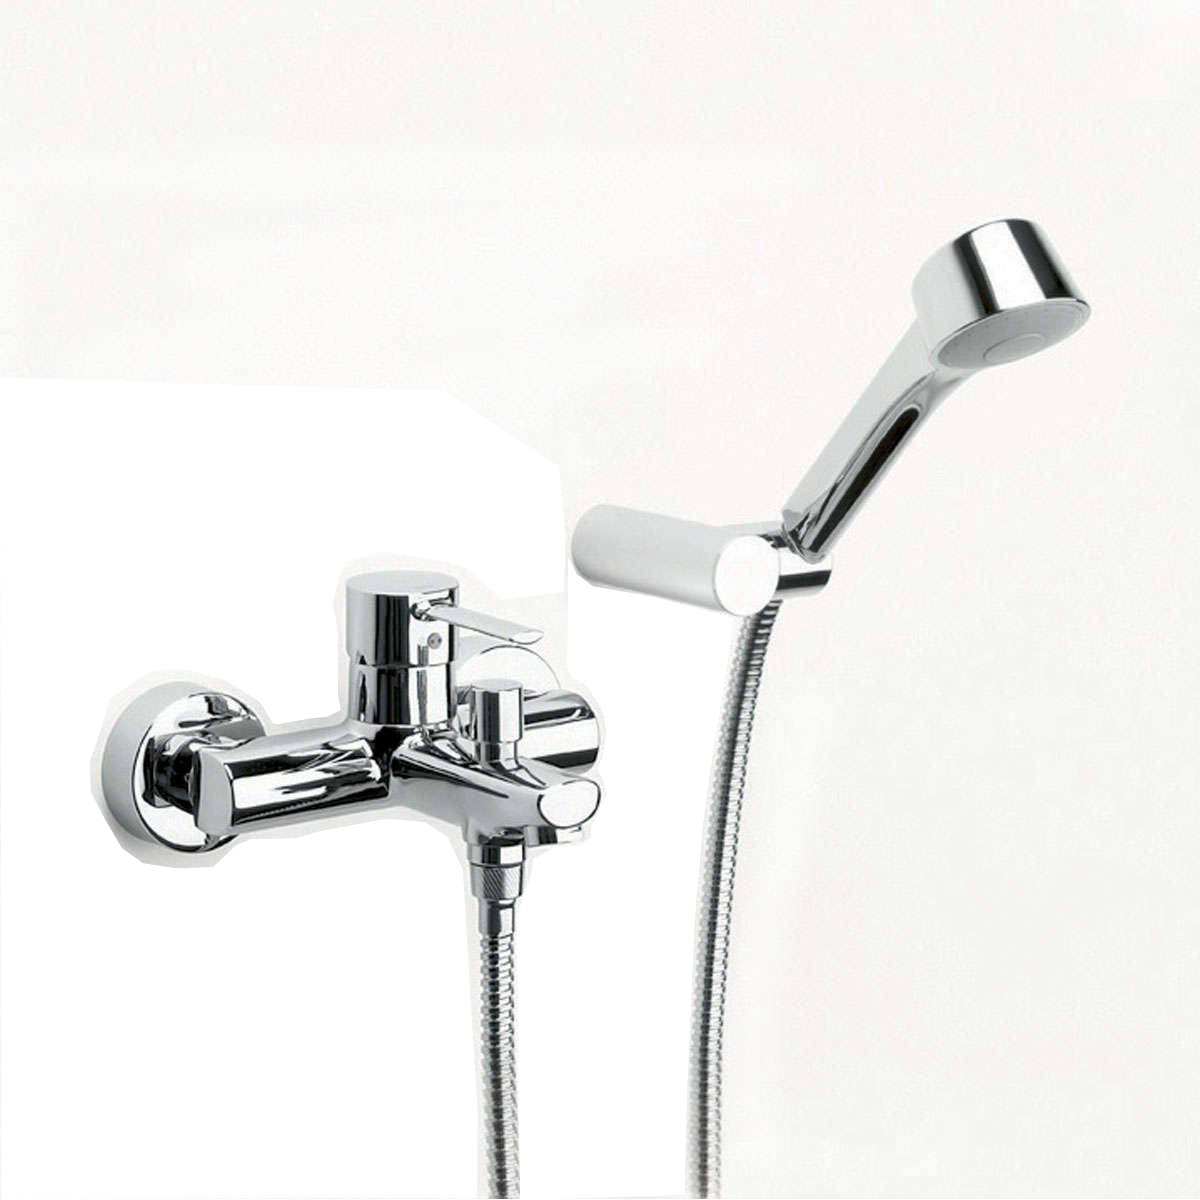 roca targa wall mounted bath shower mixer tap with kit. Black Bedroom Furniture Sets. Home Design Ideas